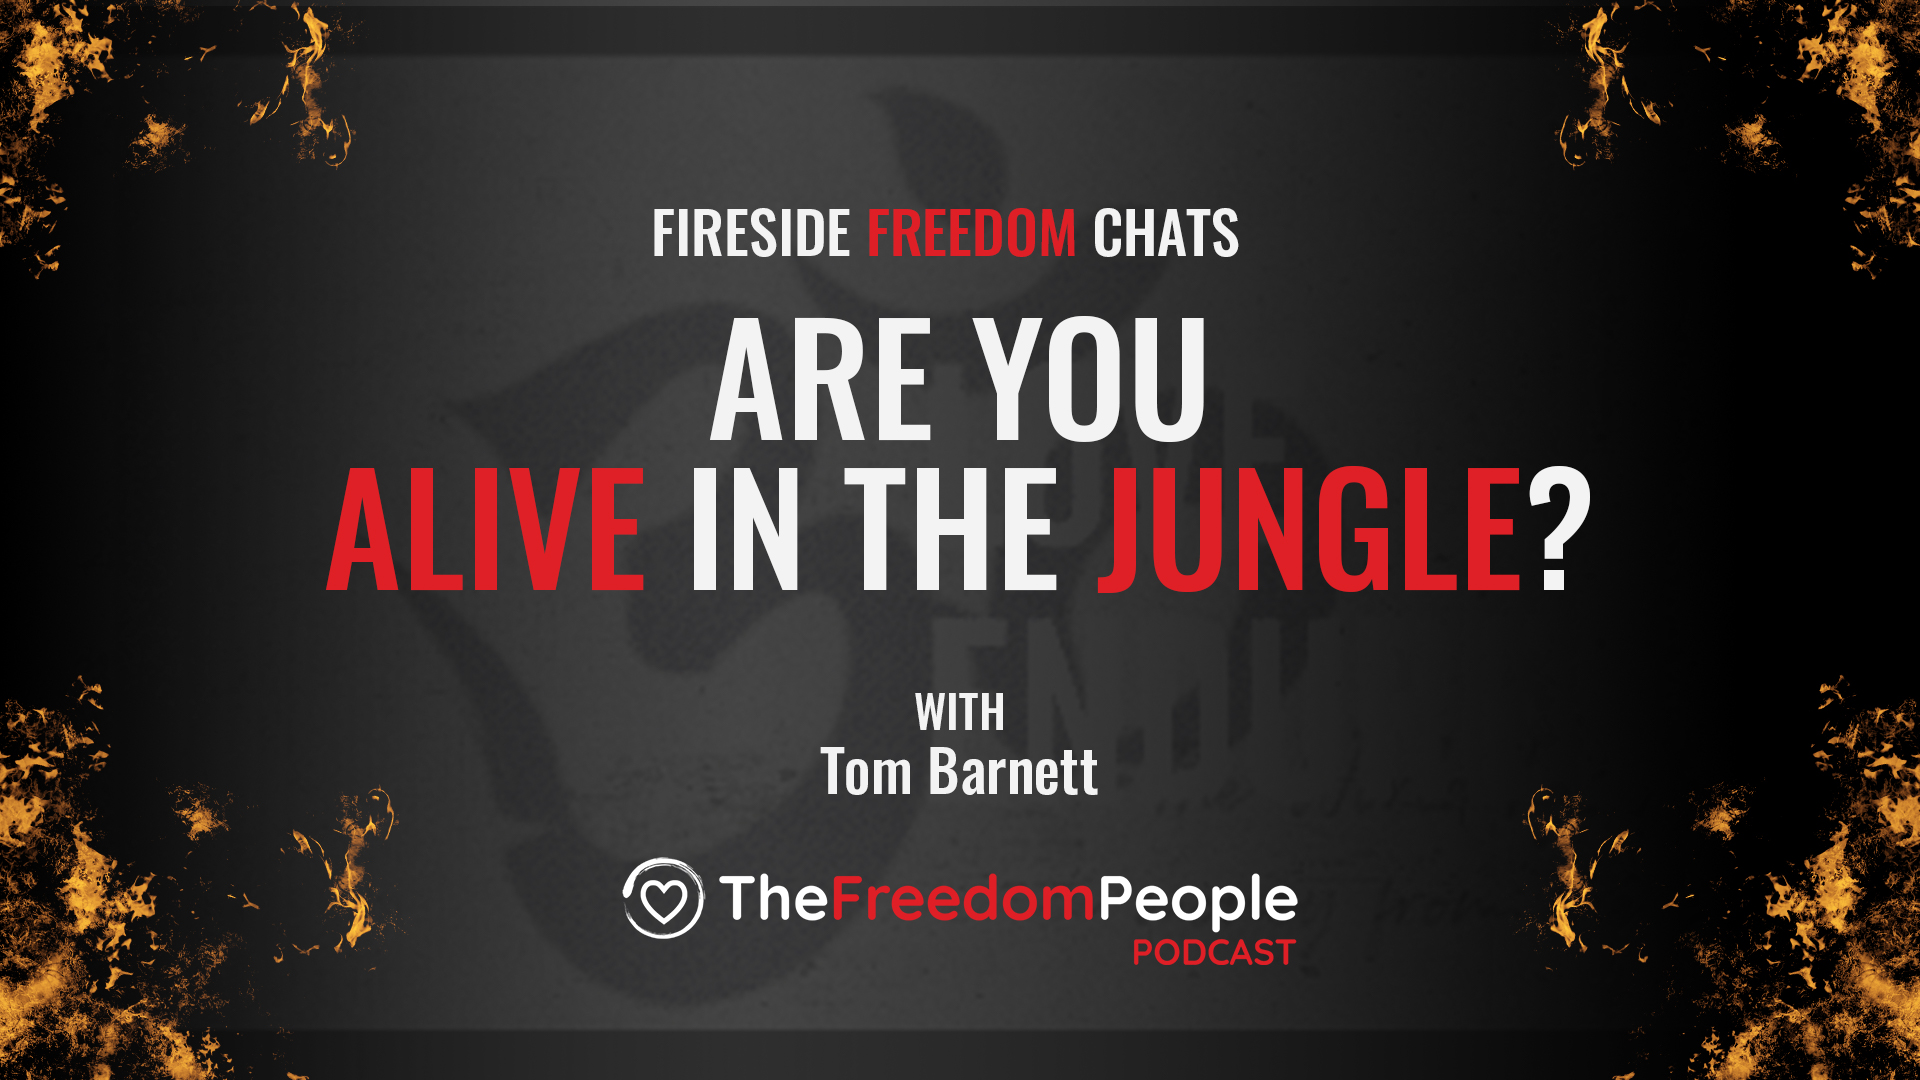 Are You Alive in the Jungle?